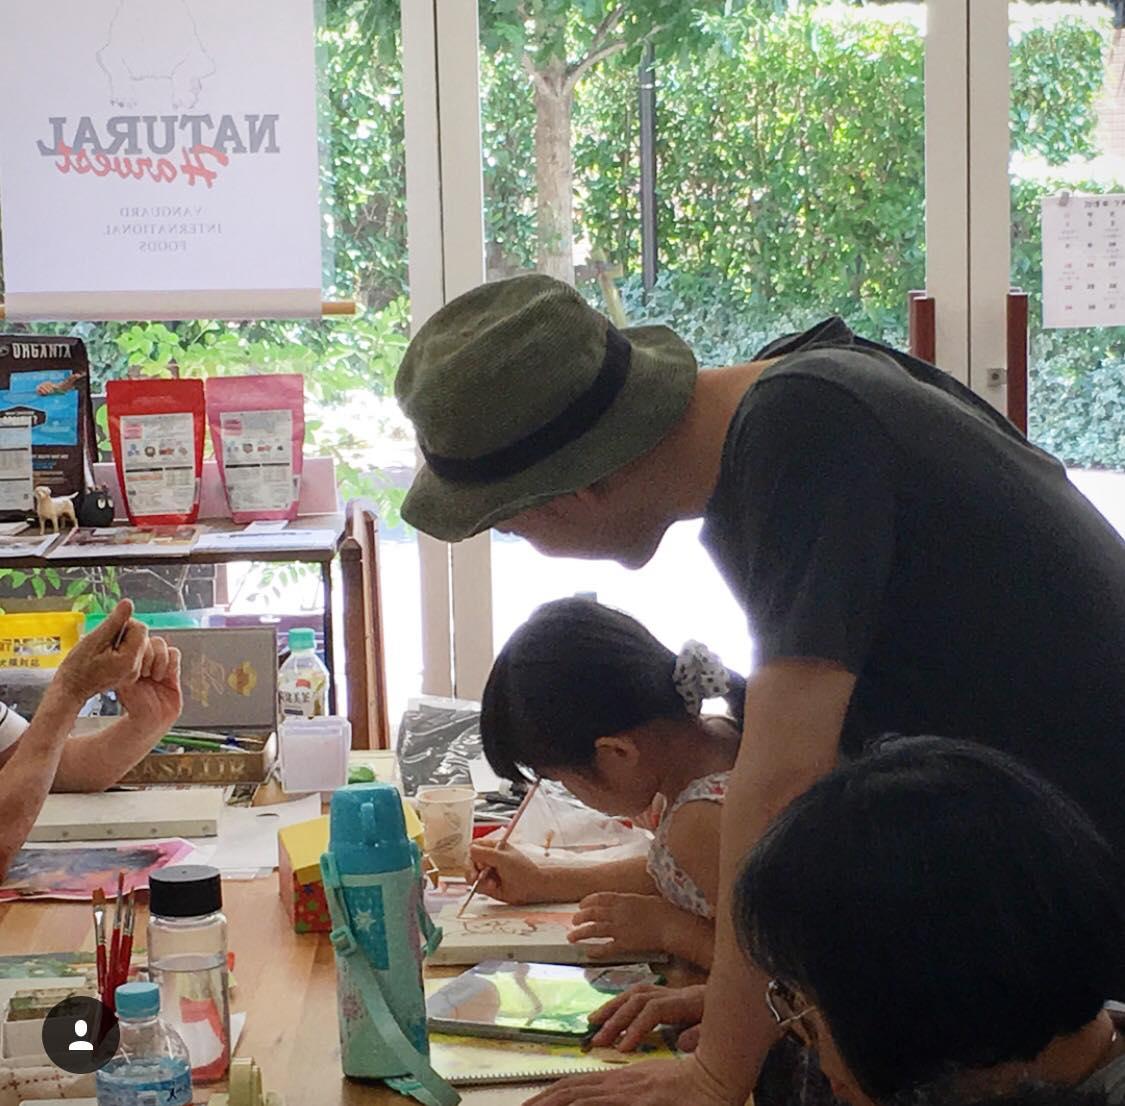 2月10日(日)長友心平先生の絵画教室